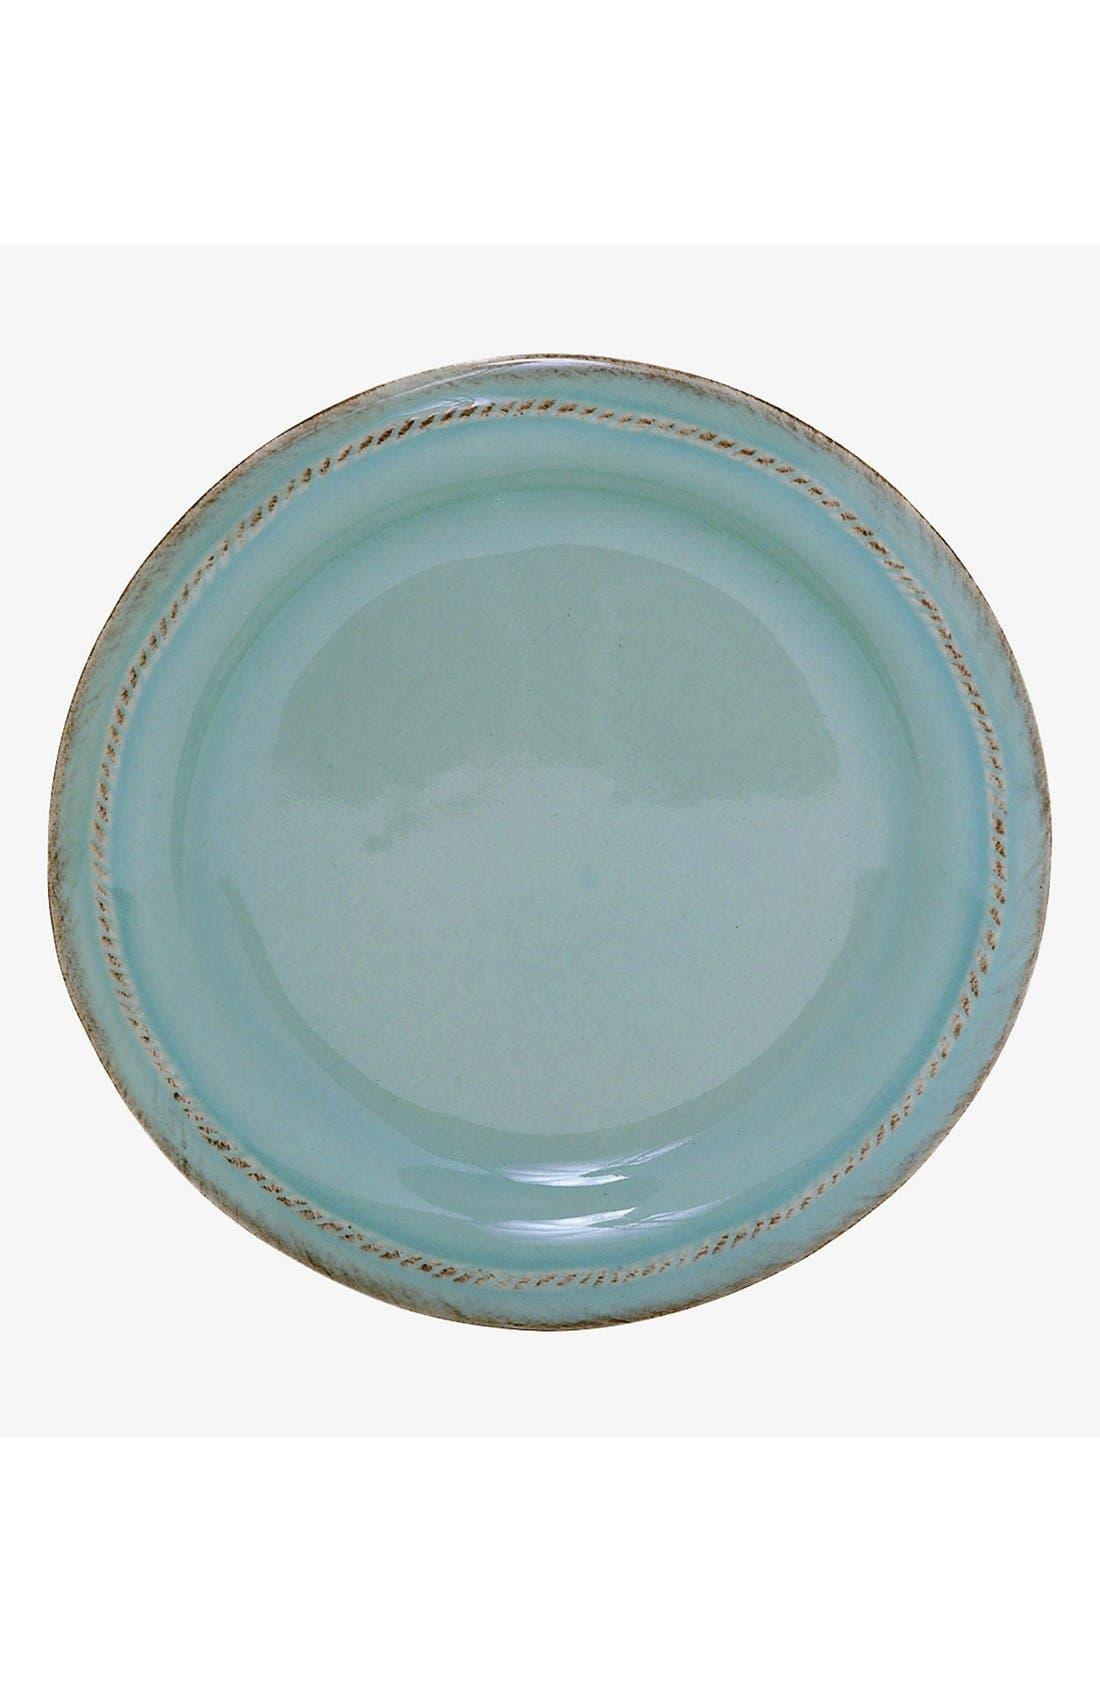 Juliska'Berry and Thread' Side Plate